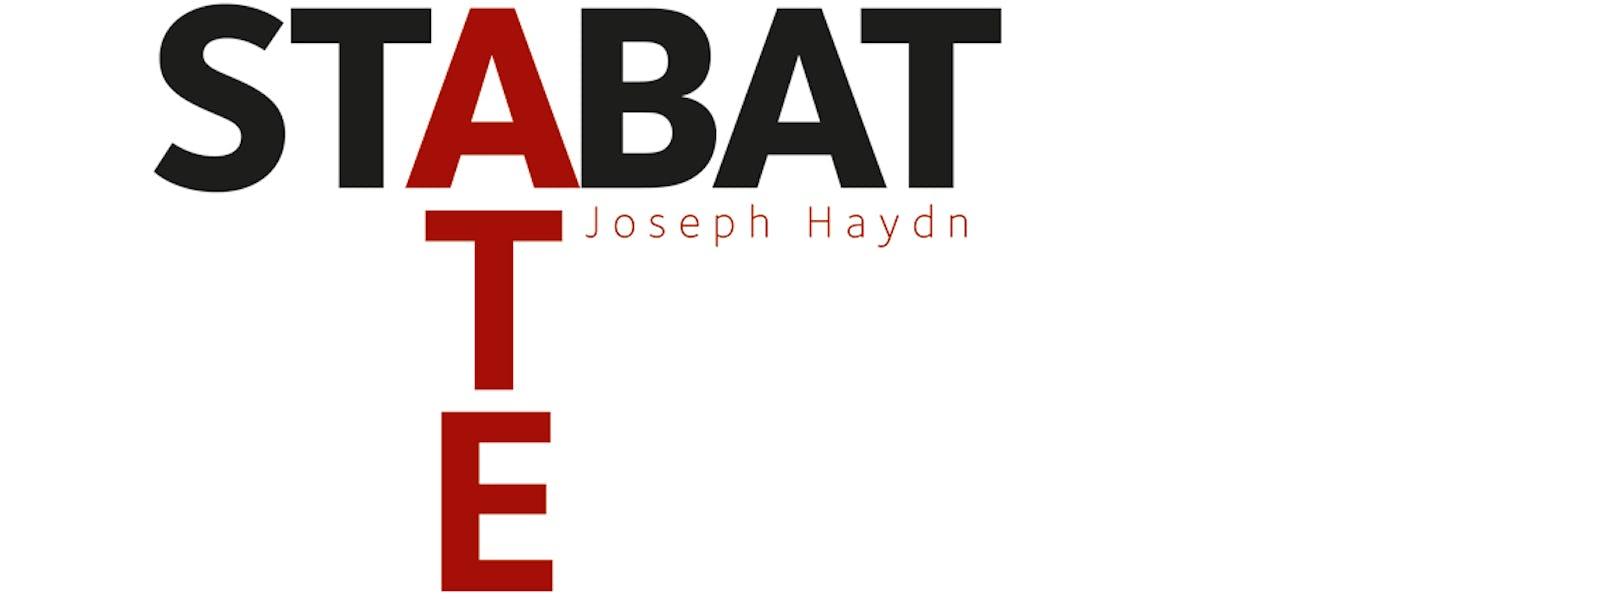 Bild - Stabat mater, Joseph Haydn